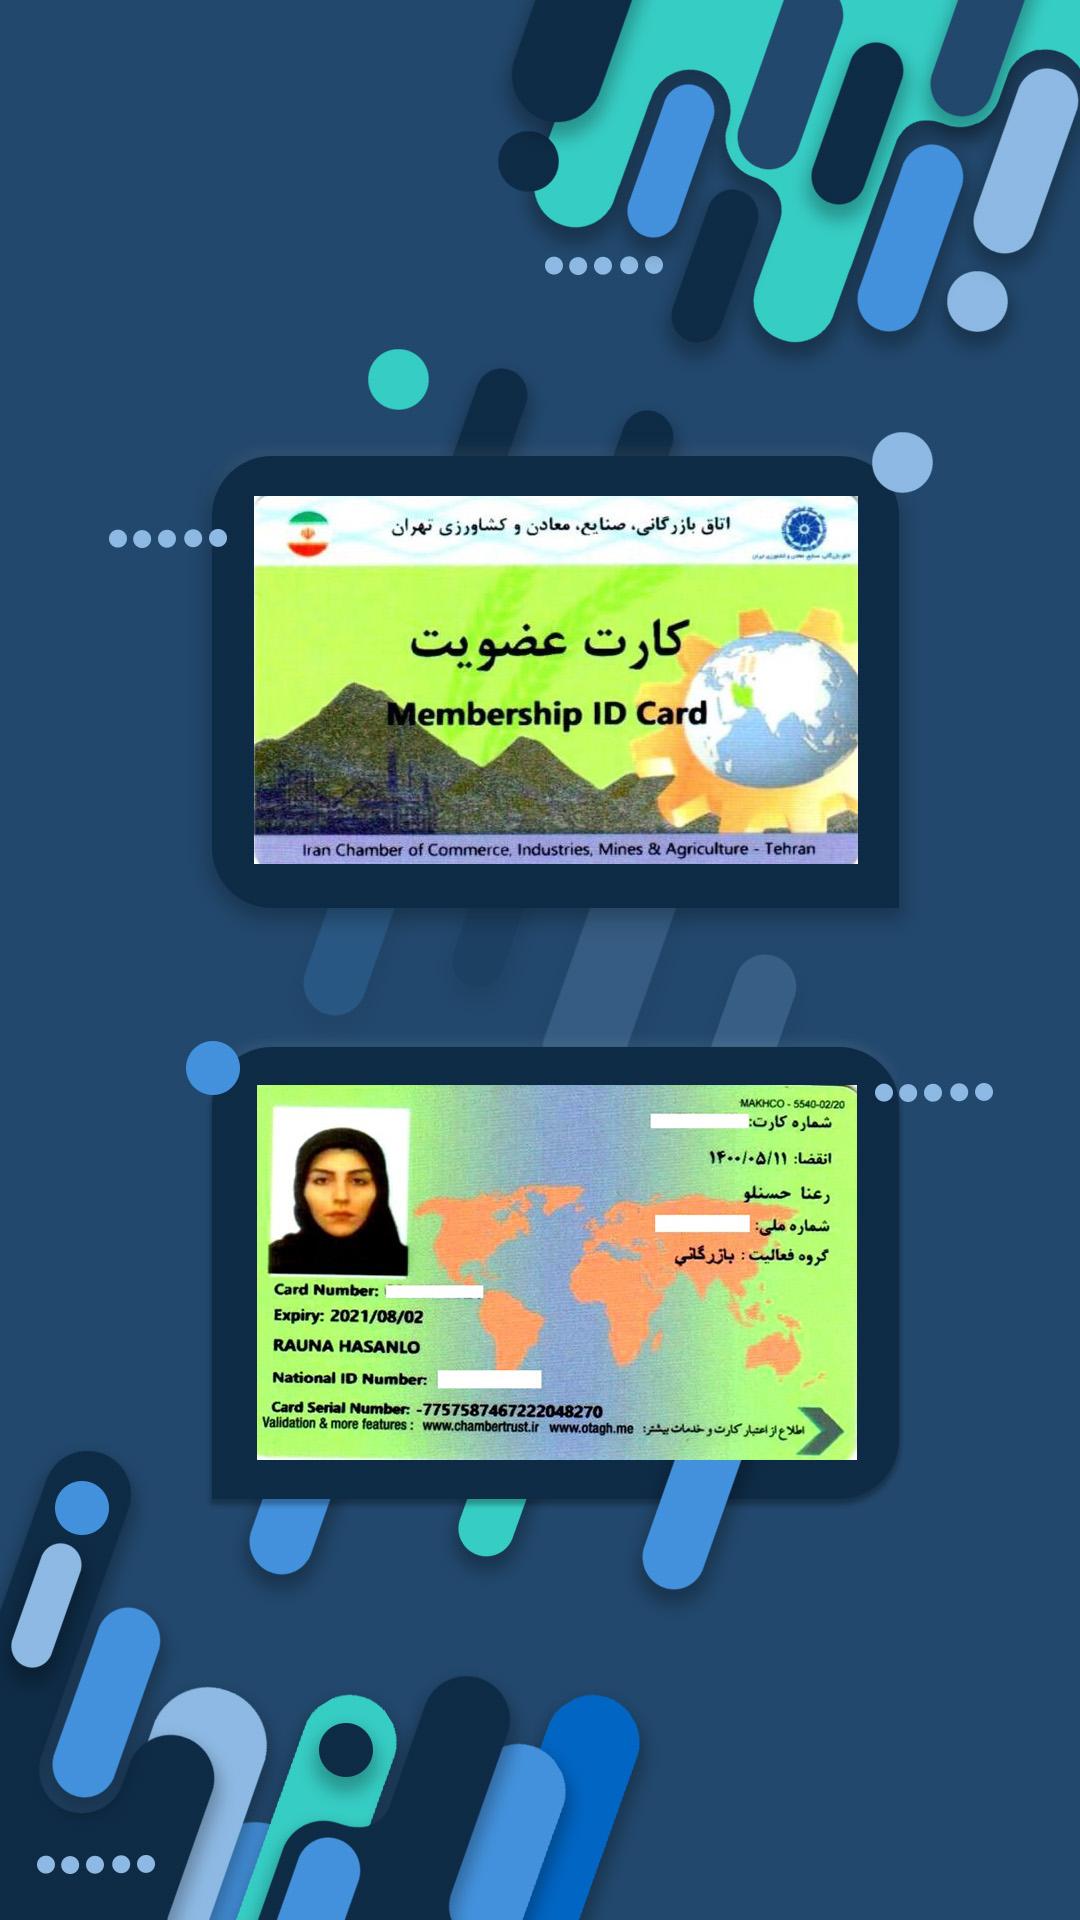 mahan-card-joind-.3-3999